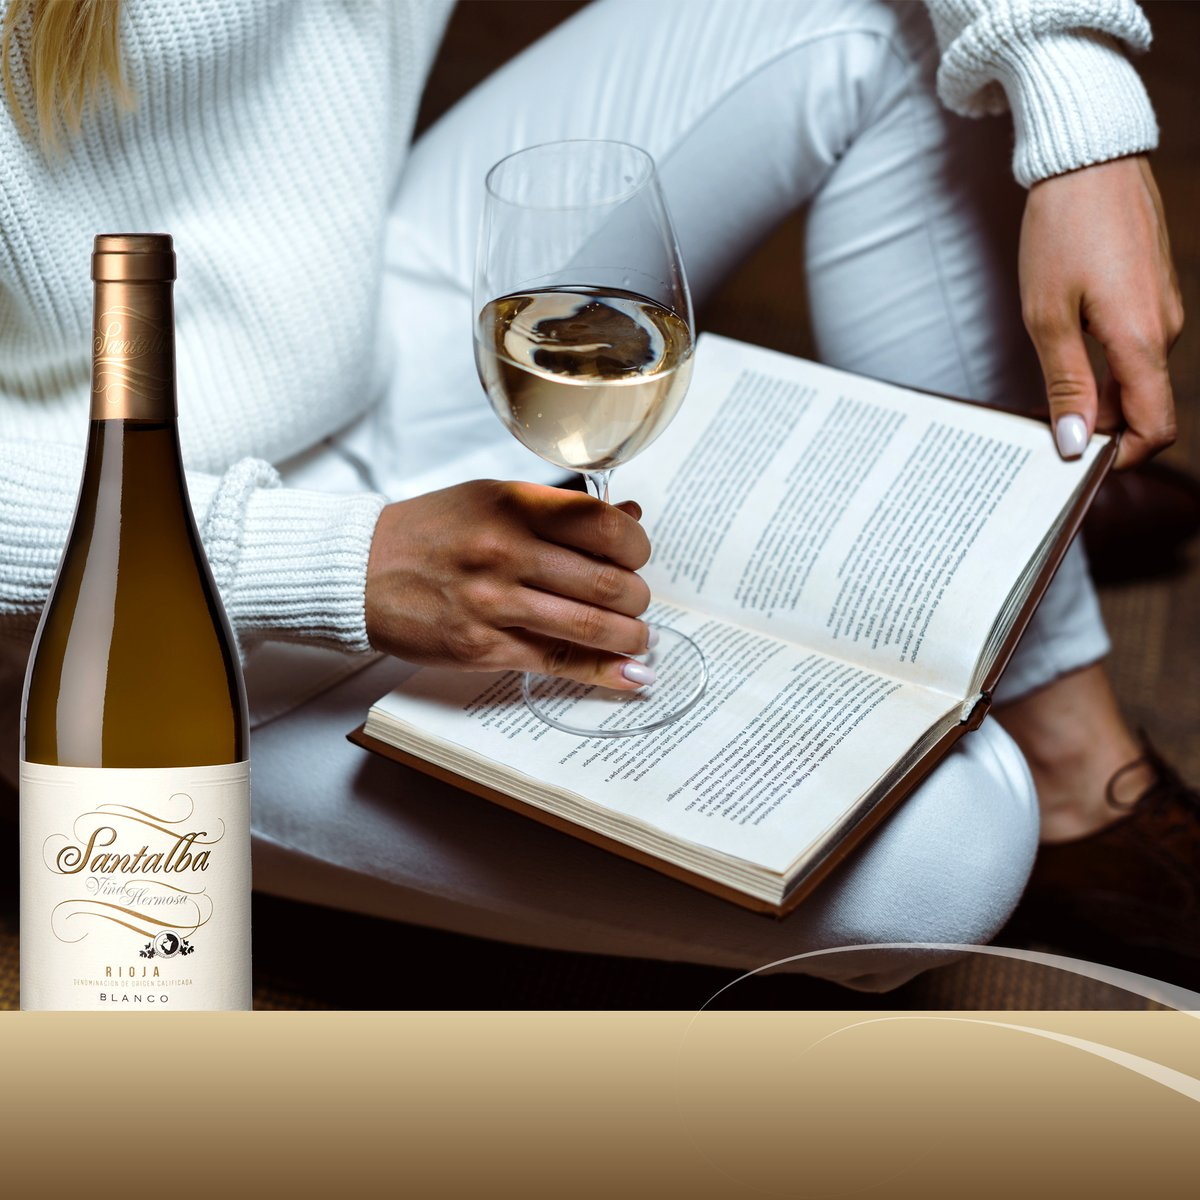 Tómate un tiempo este fin de semana para conectarte contigo mismo y desconectarte del mundo. 🧘♂️🧘♀️ Descorcha un Santalba Viña Hermosa Blanco y disfruta de tu libro favorito. 📖  #SantalbaConCalma #concalma #calma #lectura #relajación #calm #paz #BodegaSantalba #ViñaHermosaBlanco